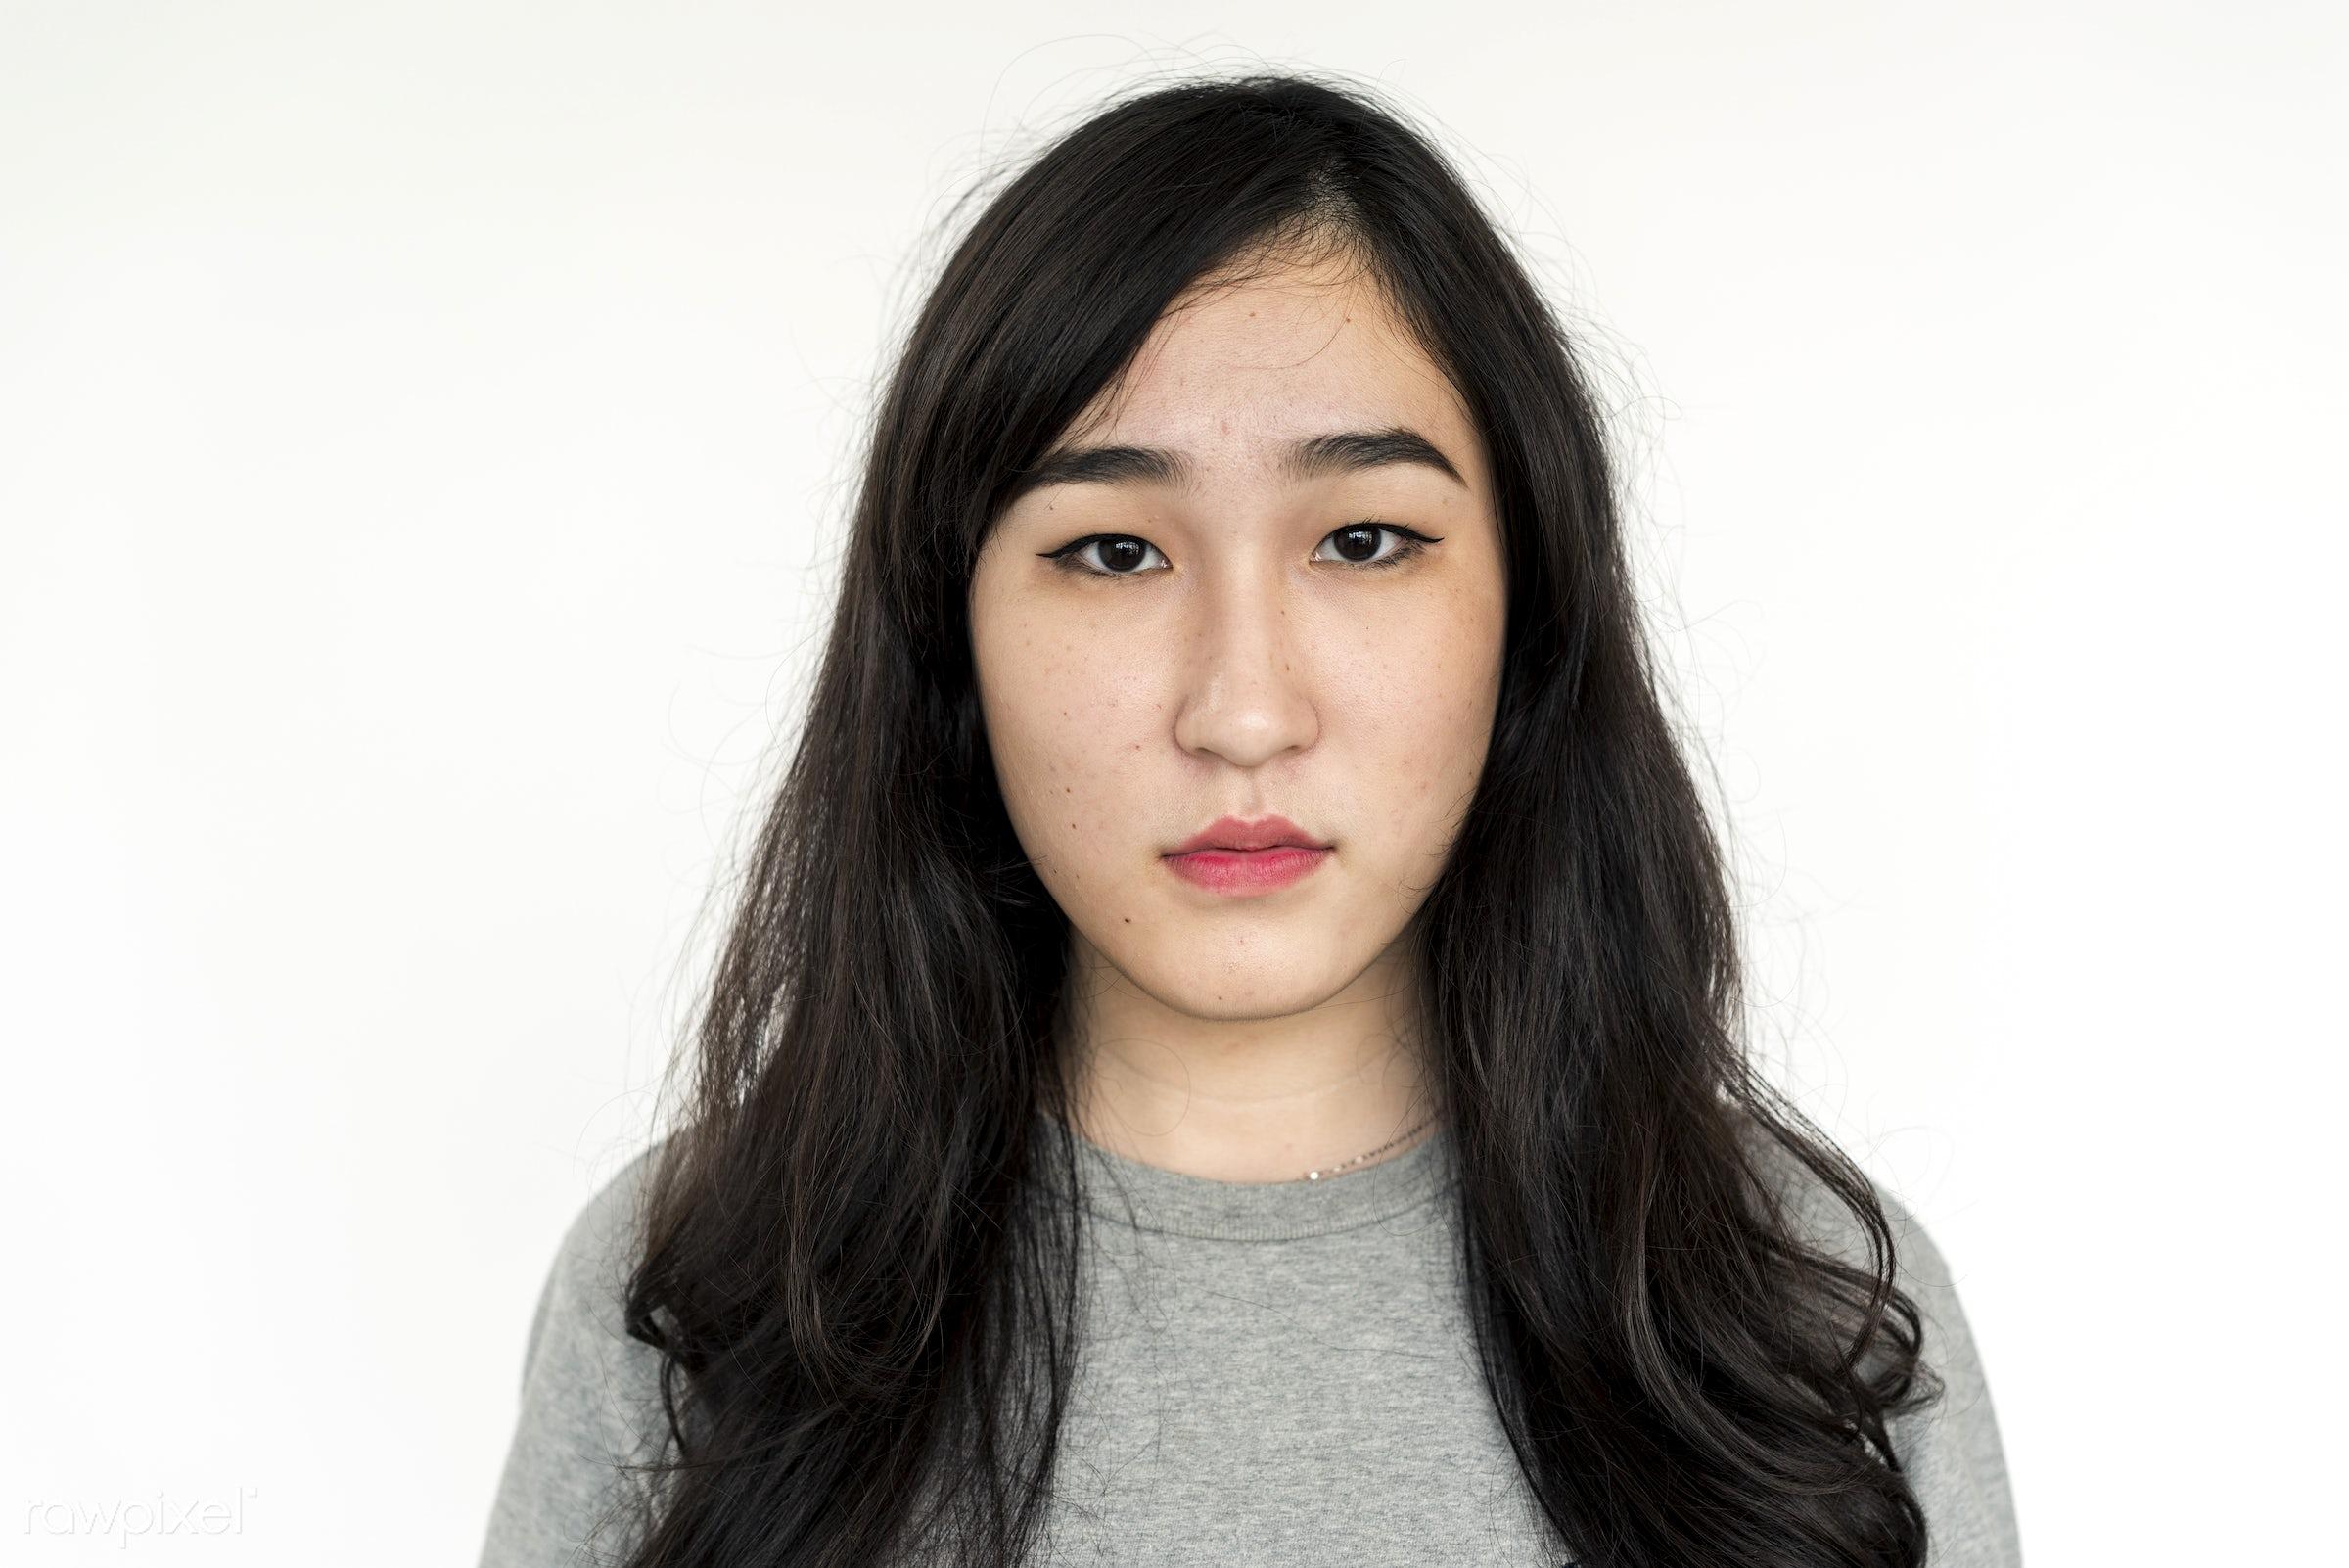 expression, studio, face, person, single, sadness, isolated on white, sad, bored, asian ethnicity, style, upset, woman,...